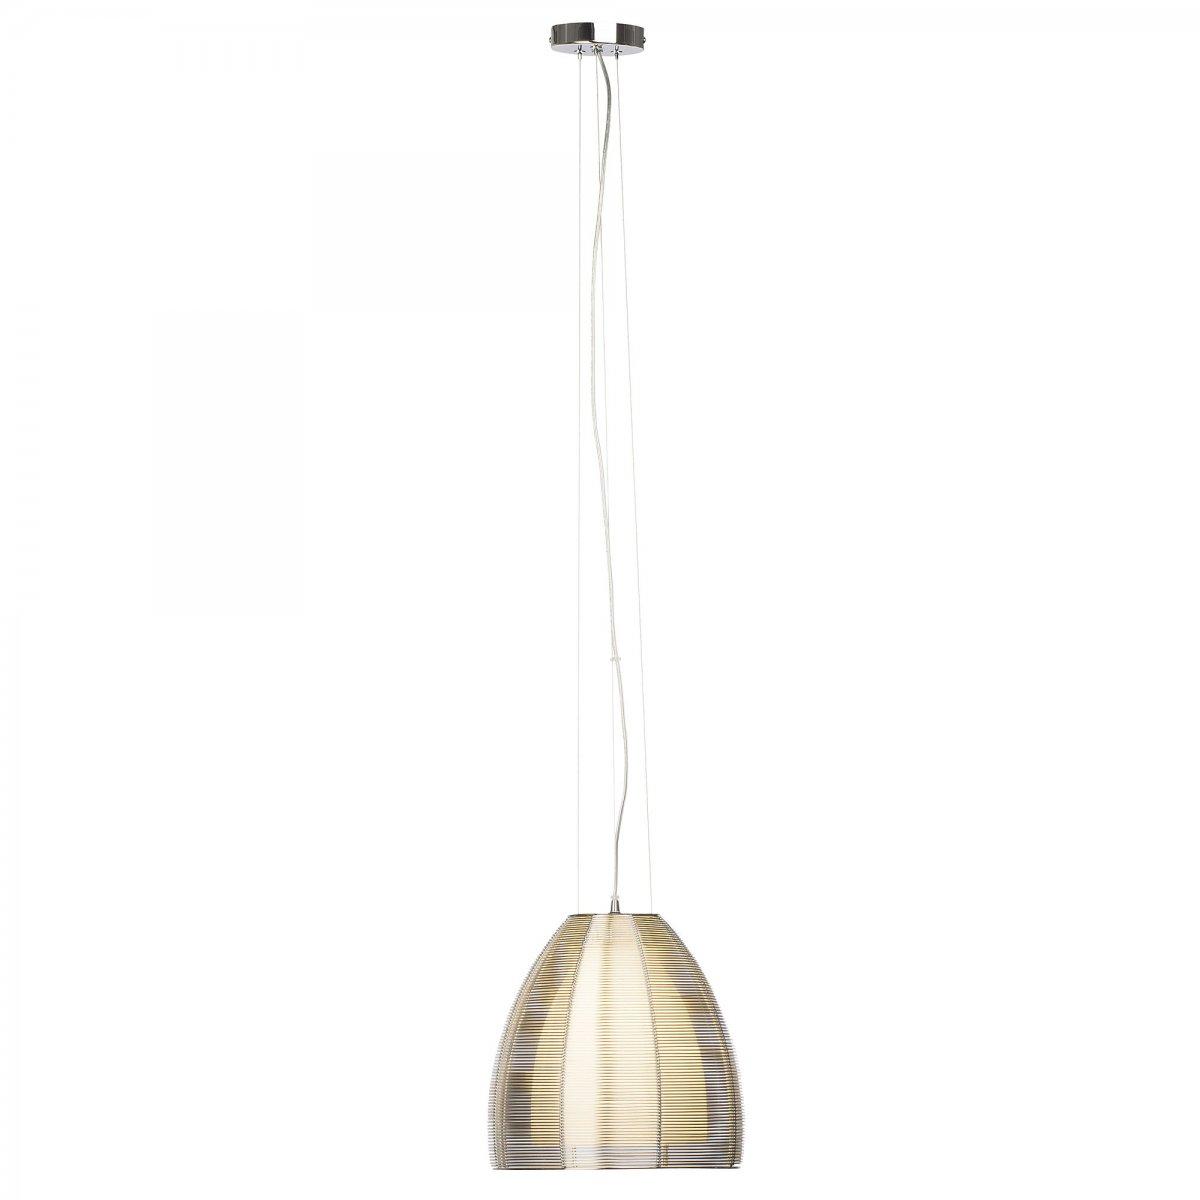 brilliant living leuchten no 61171 15 pendelleuchte relax chrom 30 cm eur 146 83 leuchten. Black Bedroom Furniture Sets. Home Design Ideas